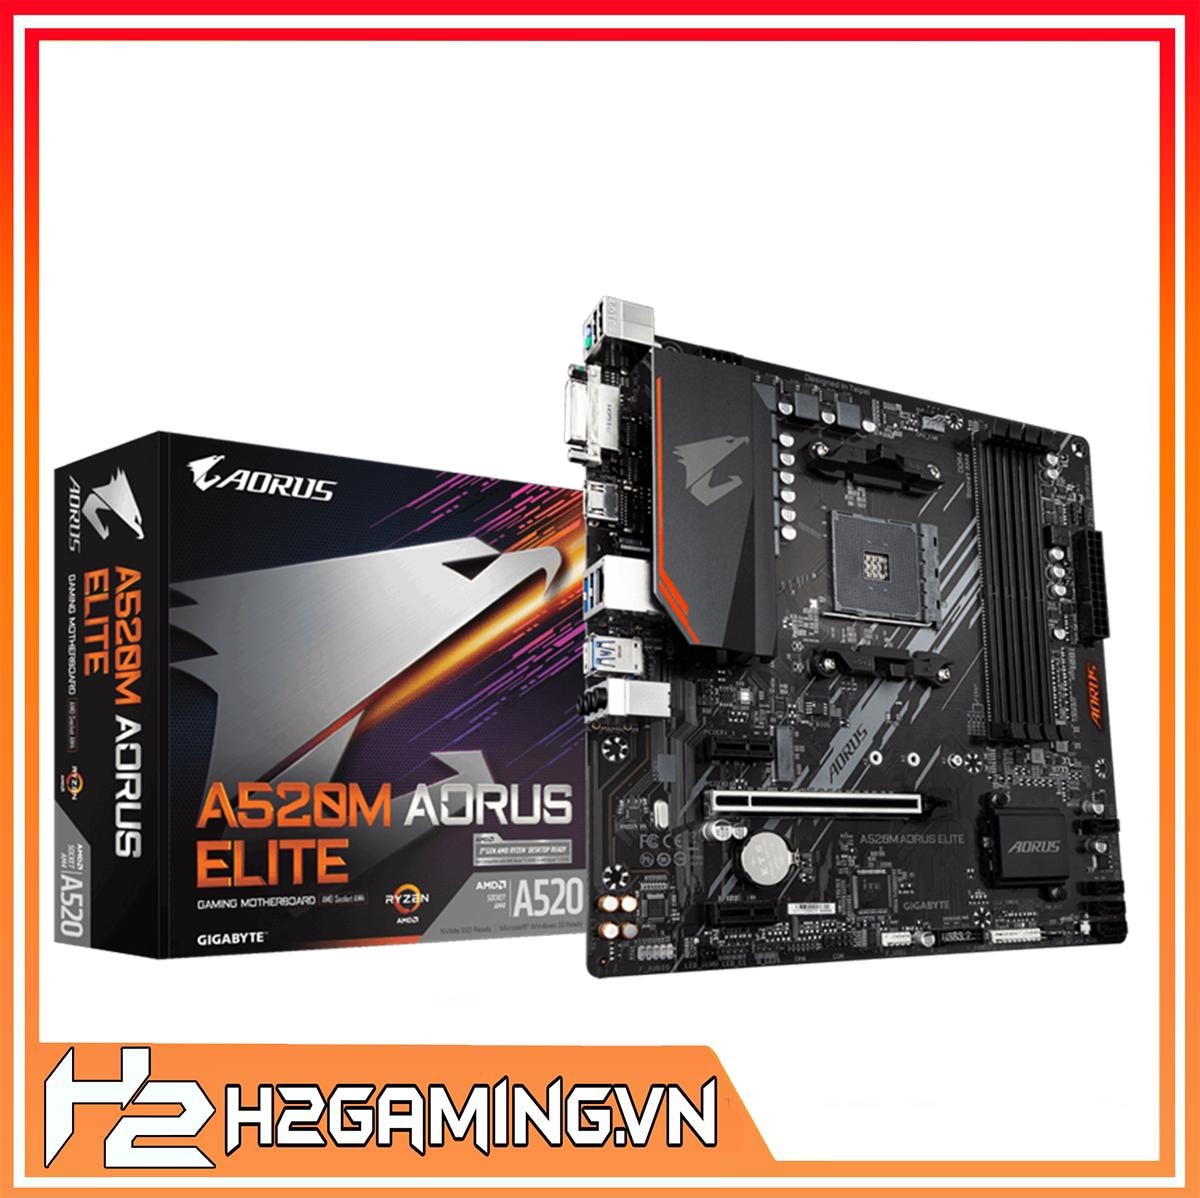 Mainboard_Gigabyte_A520M_AORUS_ELITE_(AMD_A520,_Socket_1200,_m-ATX,_4_khe_RAM_DDR4)